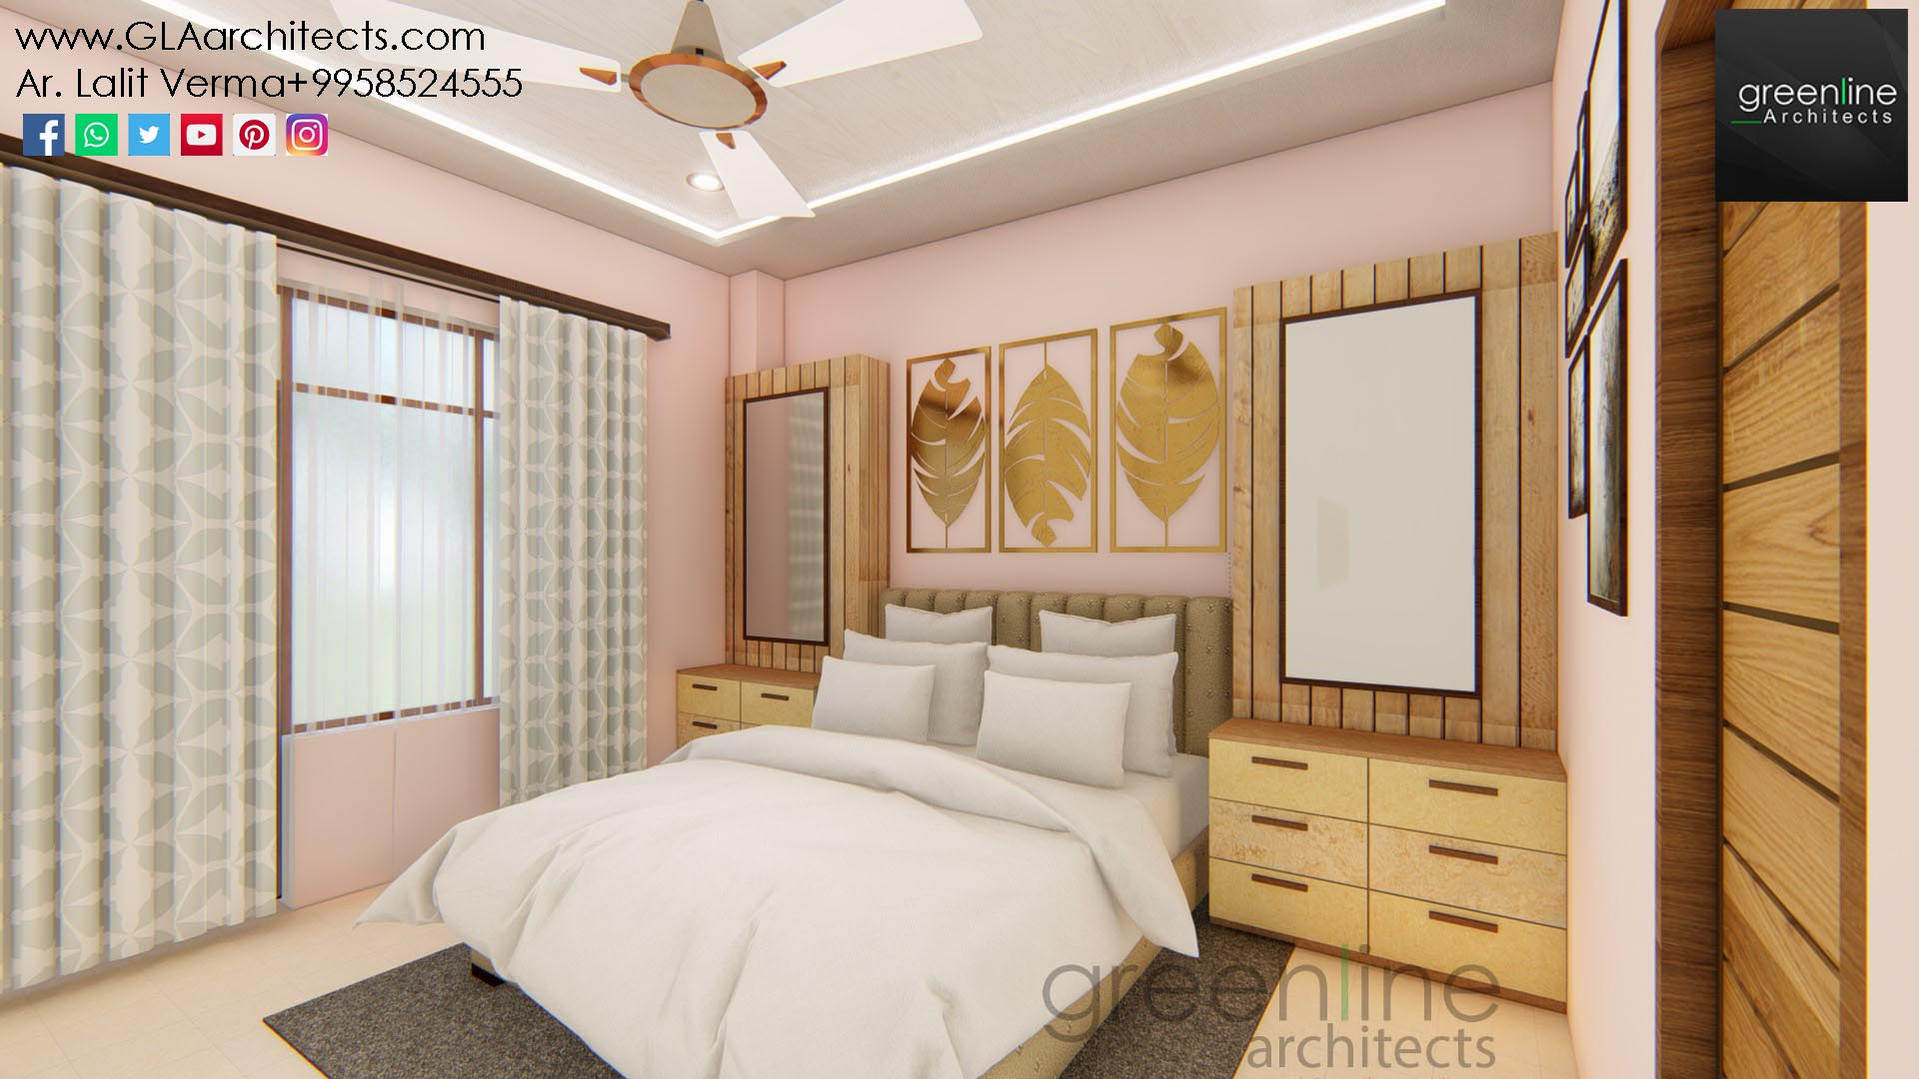 3 BHK-Apartment_Home Interior (10).jpg